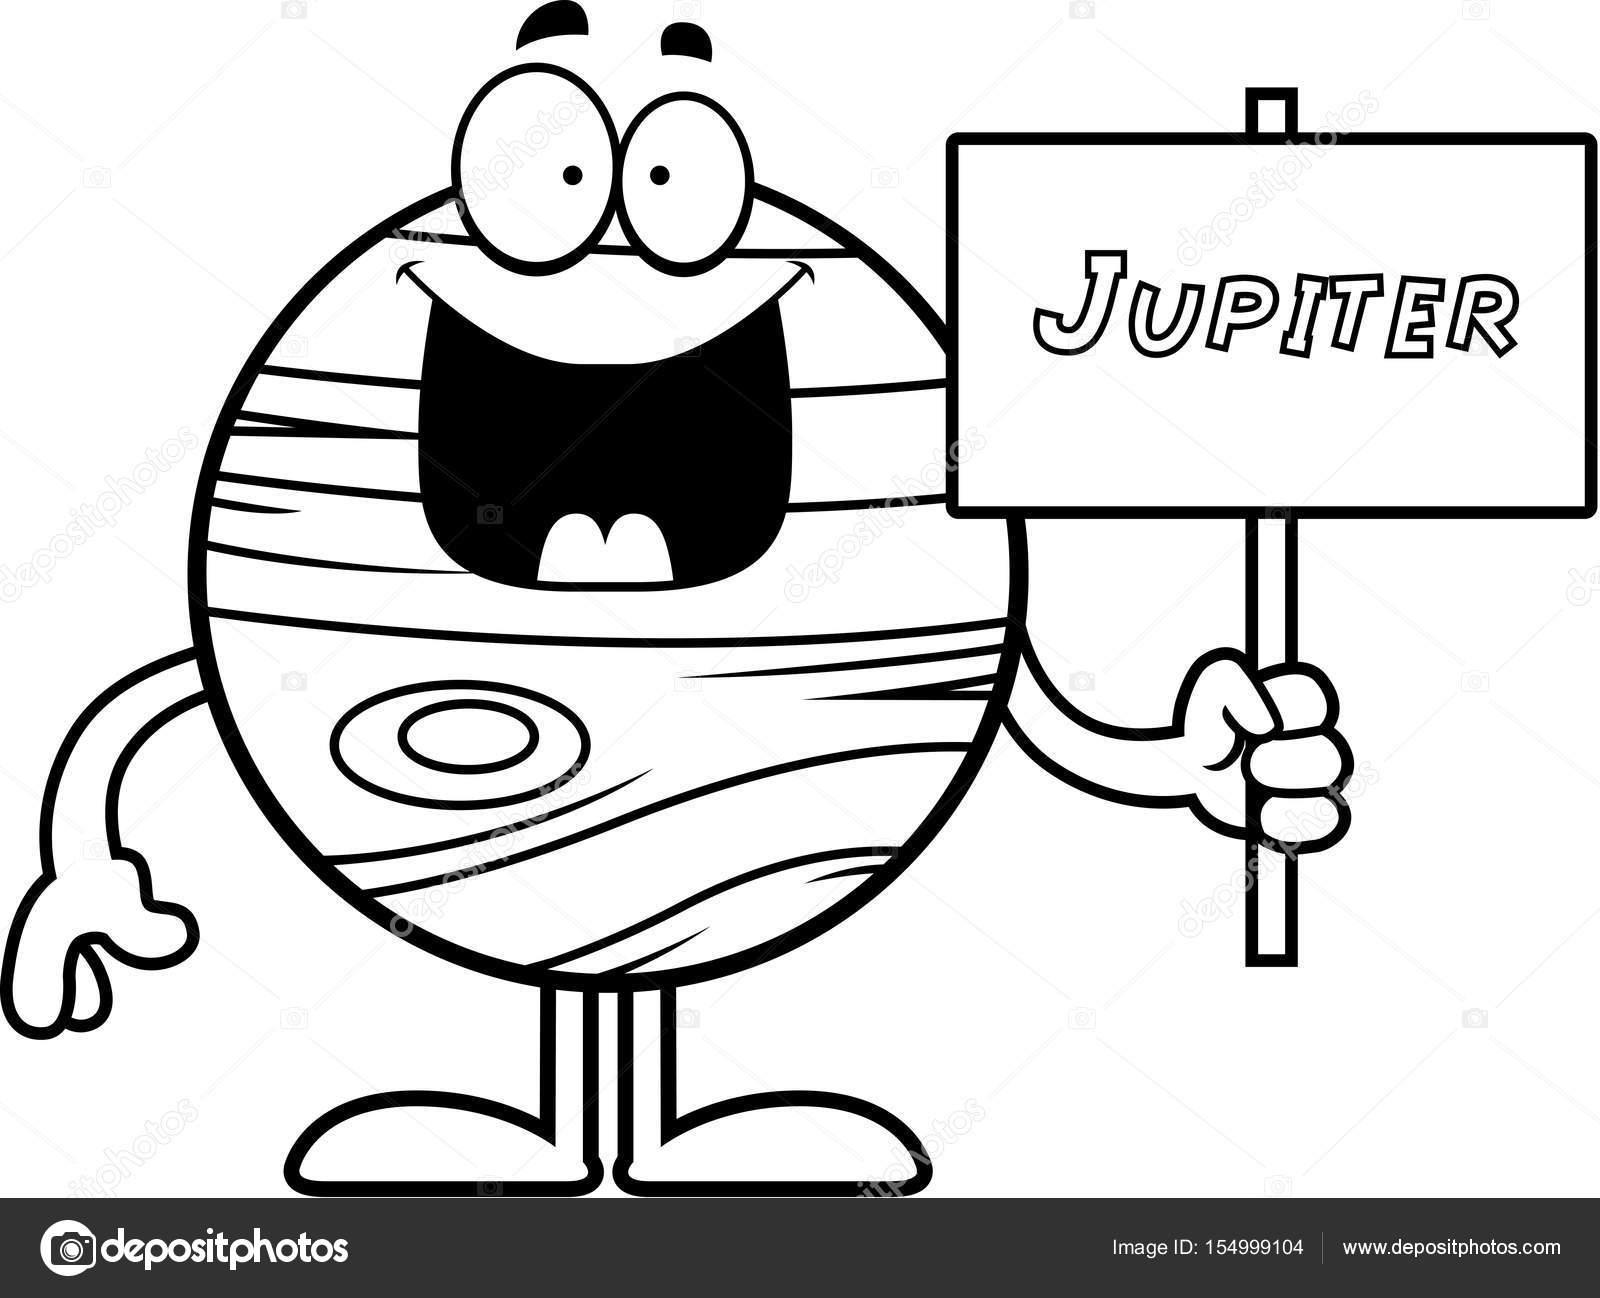 1600x1298 Cartoon Jupiter Sign Stock Vector Cthoman